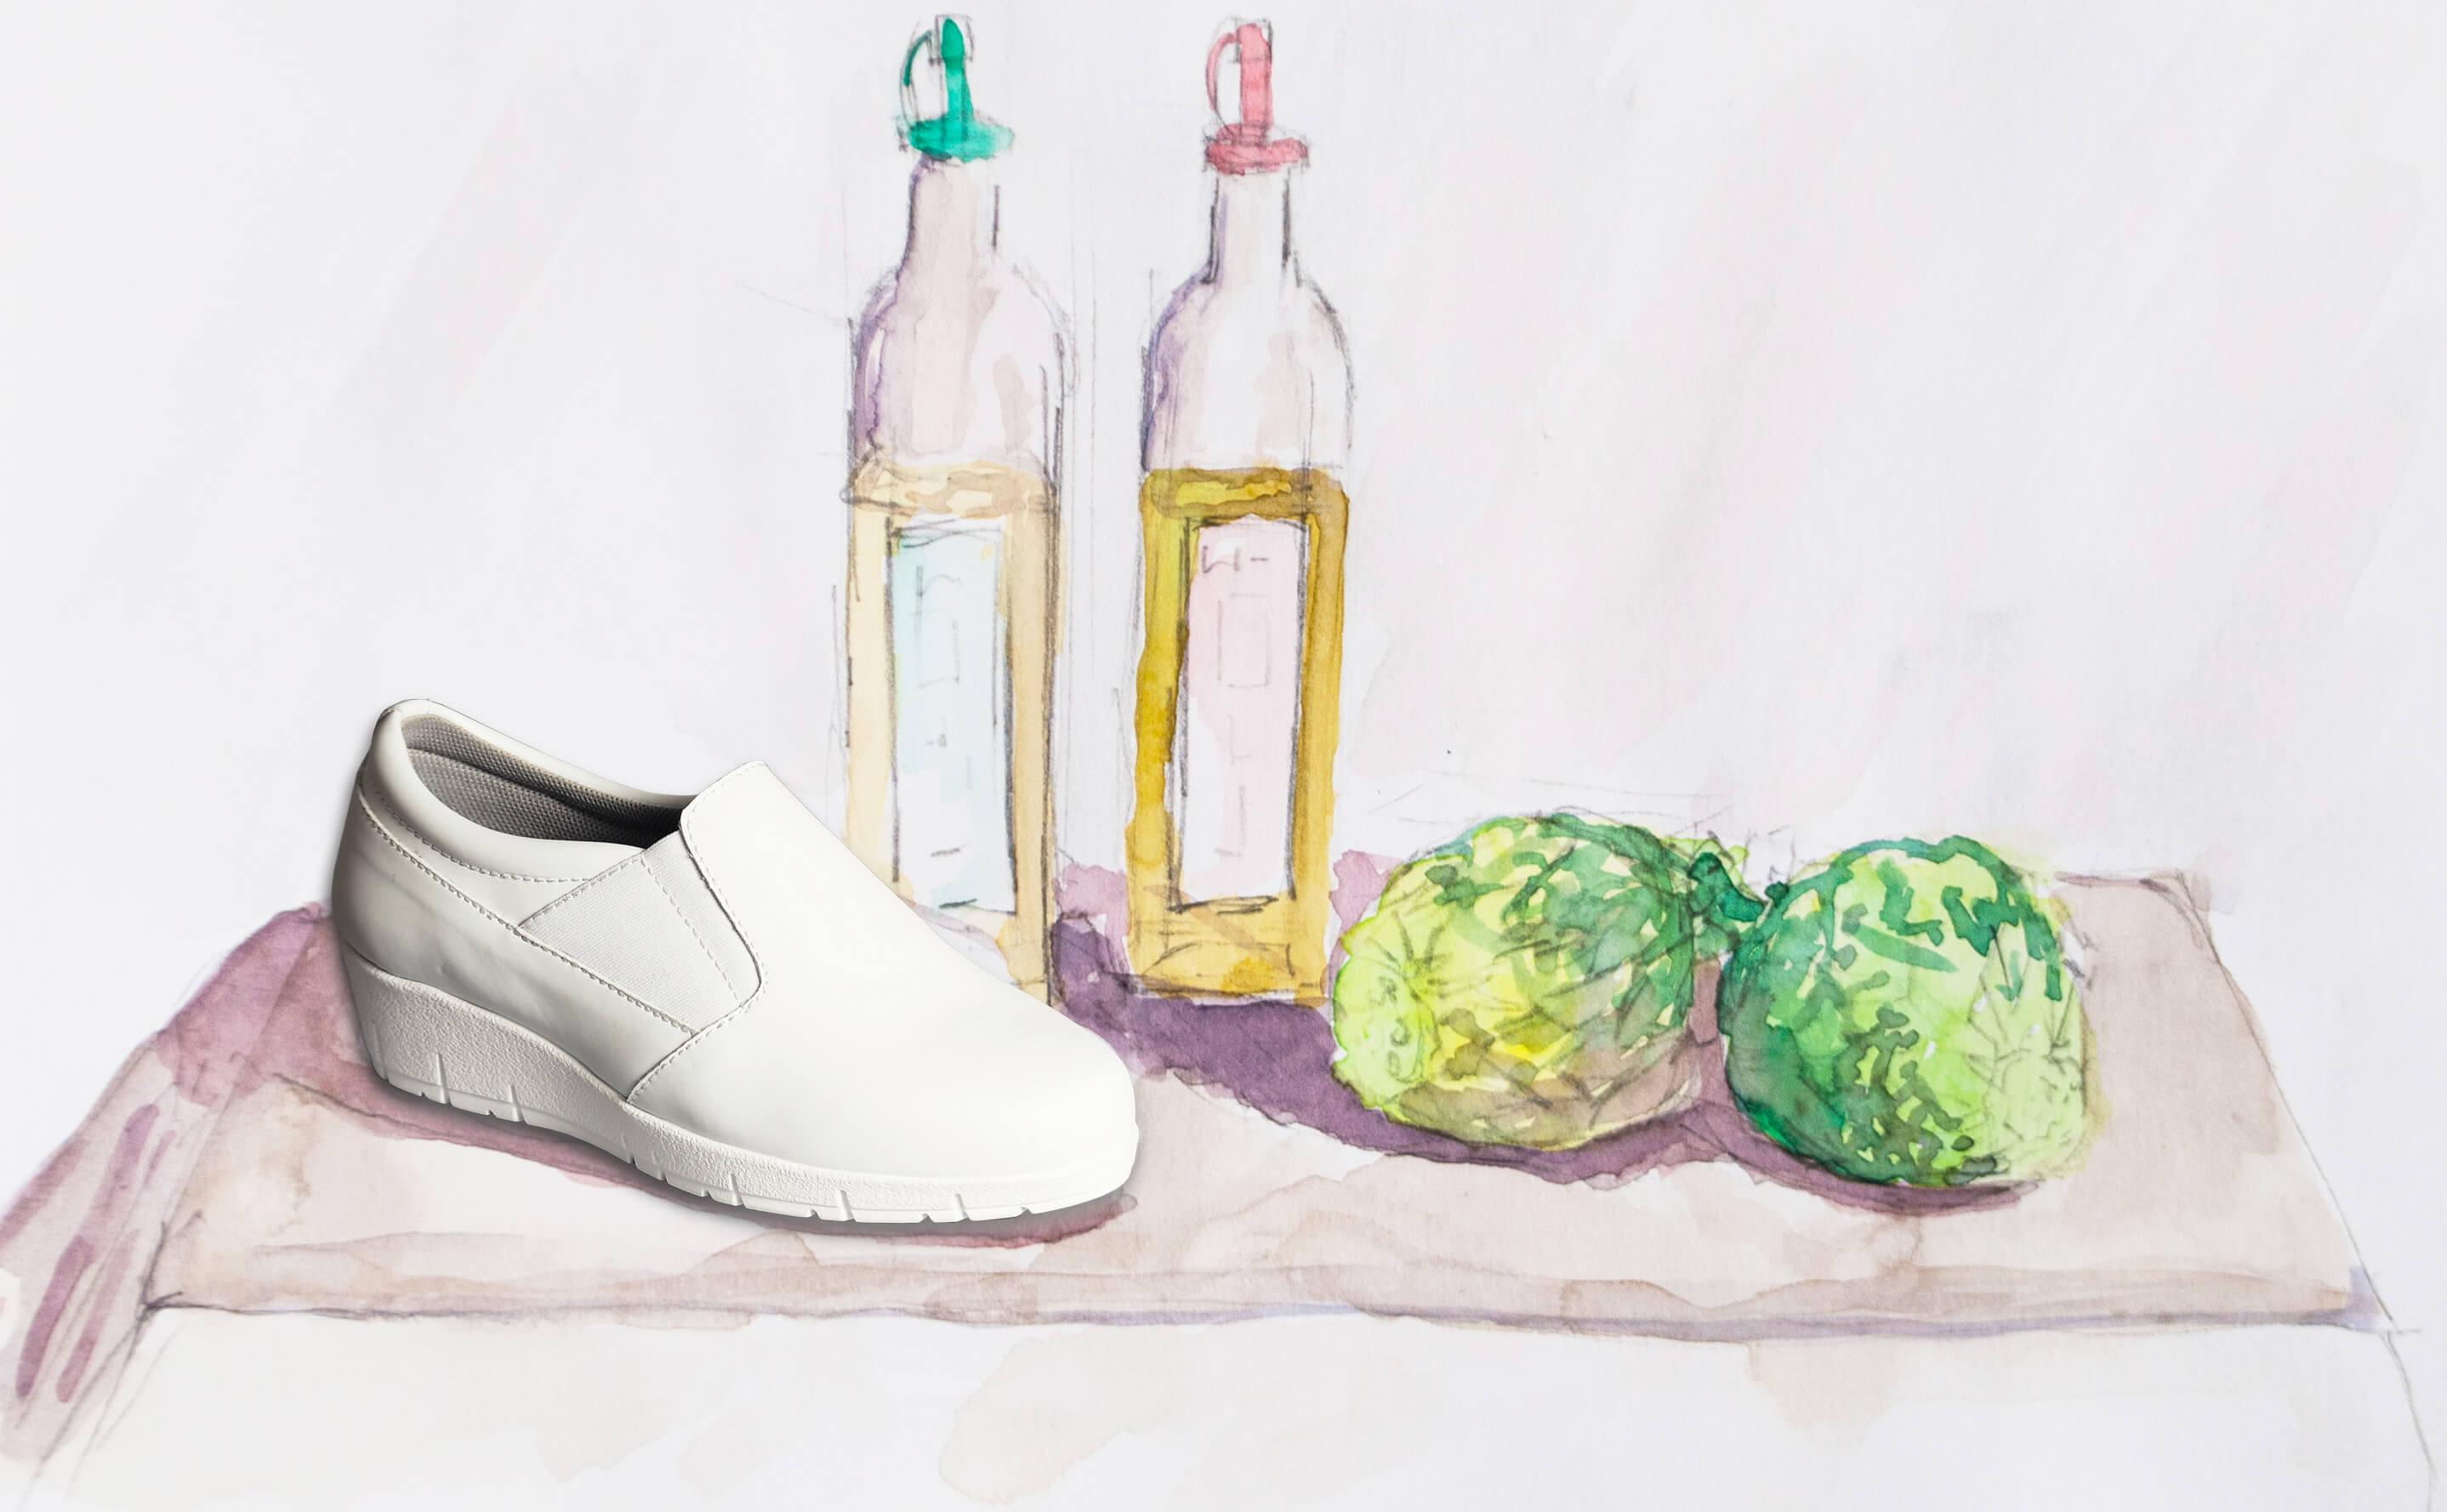 Zapatos modelo Denise